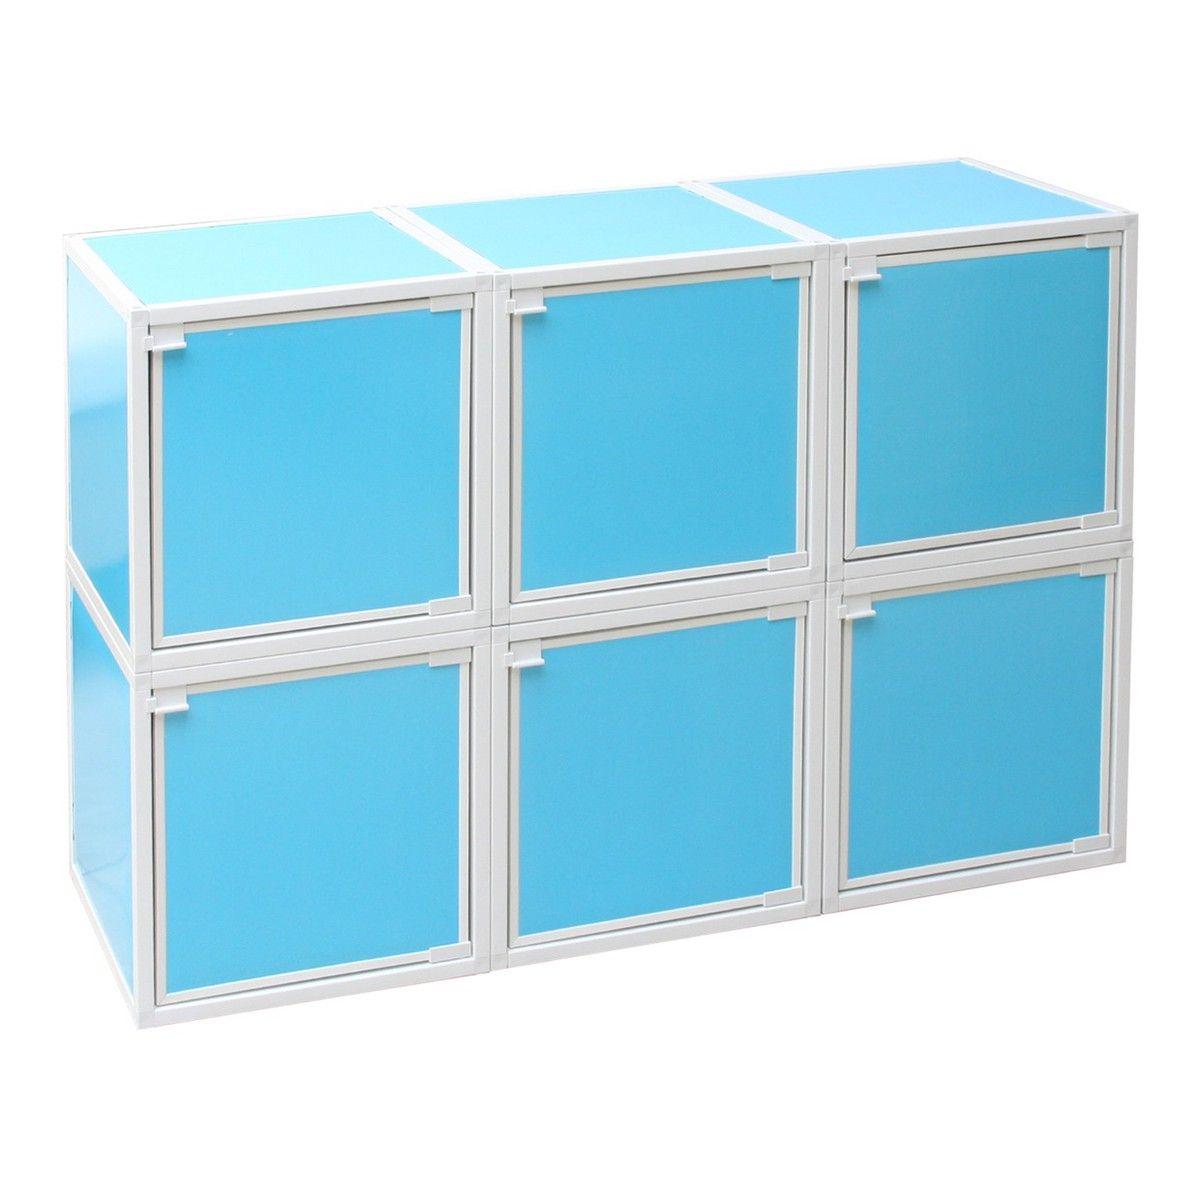 Modular Box Blue Set Of 6